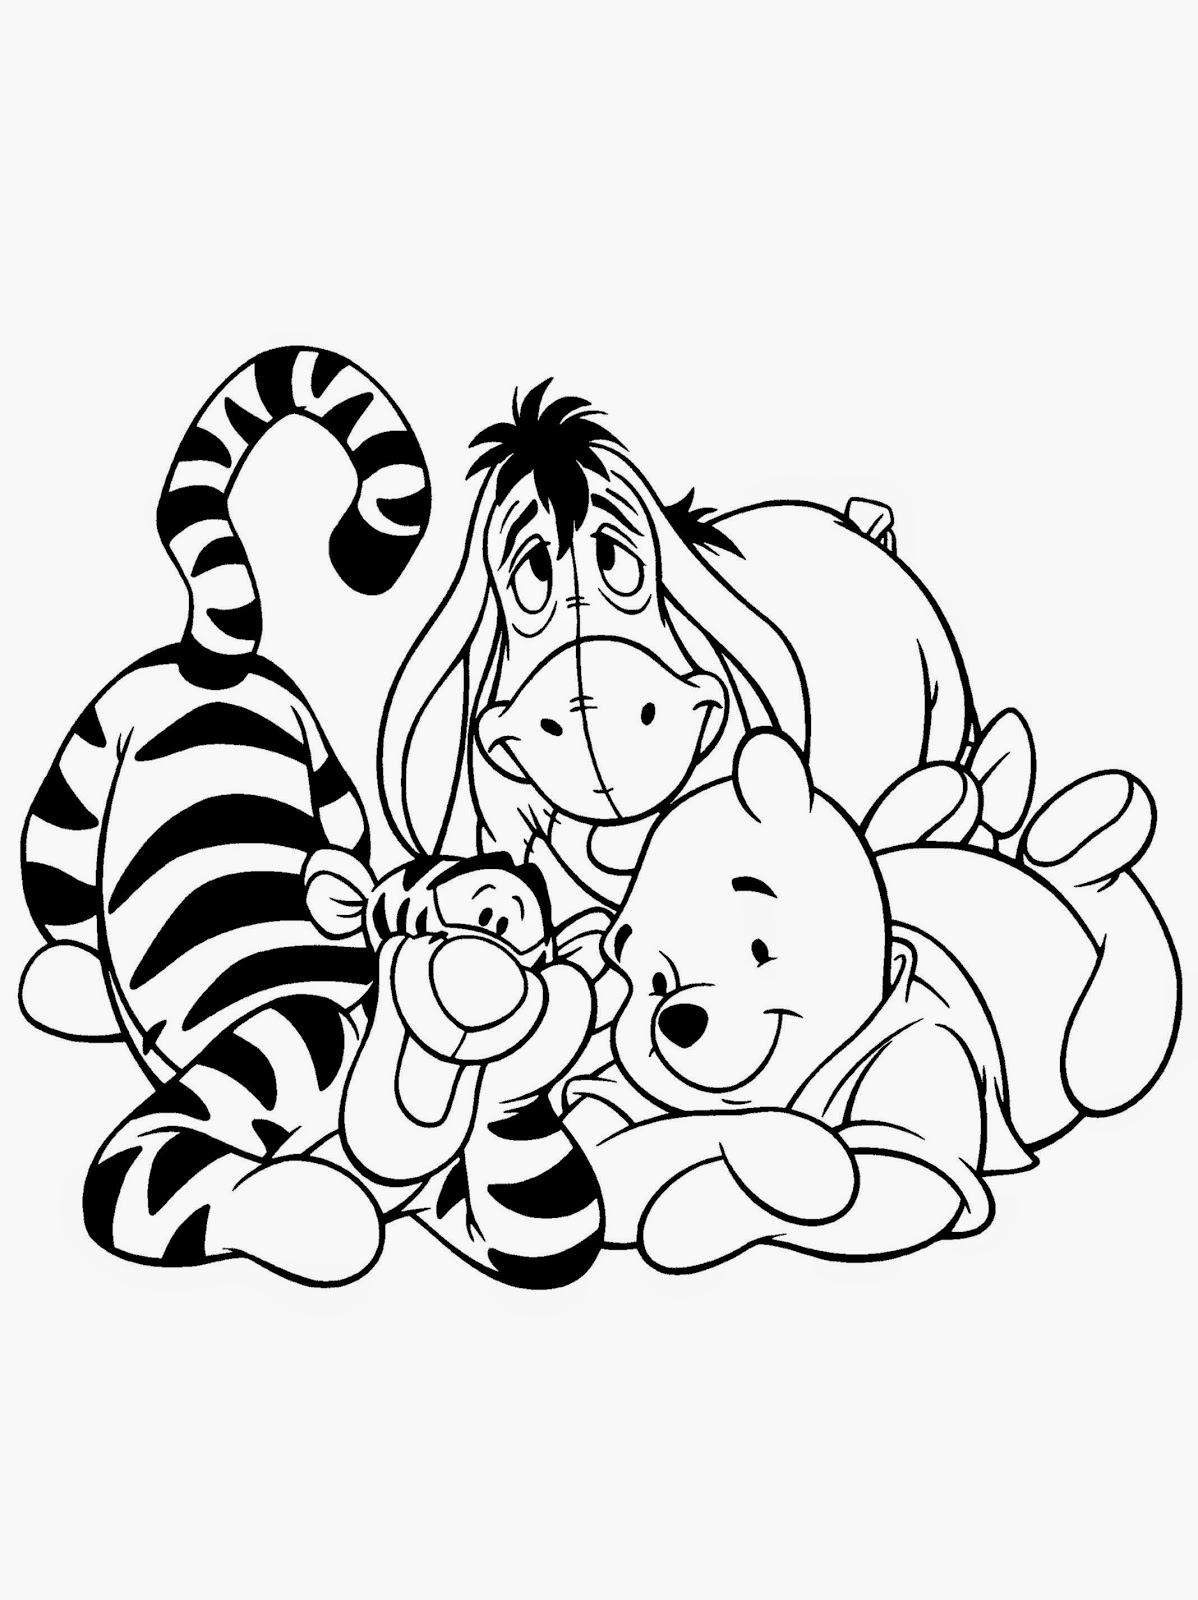 pooh printables cute disney pooh bear coloring page h m coloring pages printables pooh